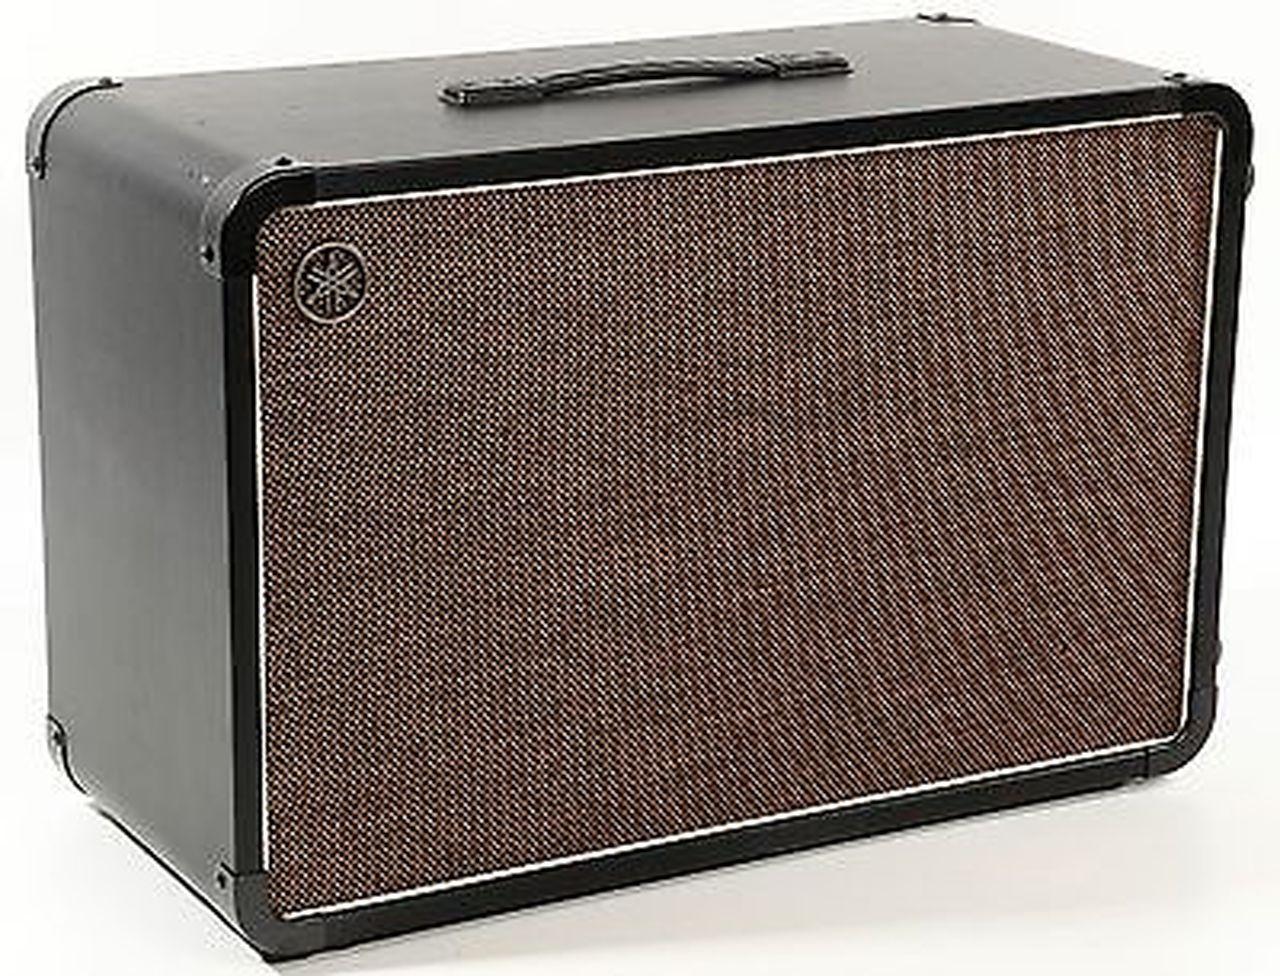 Yamaha THRC212 300 Watt 2x12'' THR Closed Back Stereo Speaker Cabinet Amp Amplifier (THRC 212)